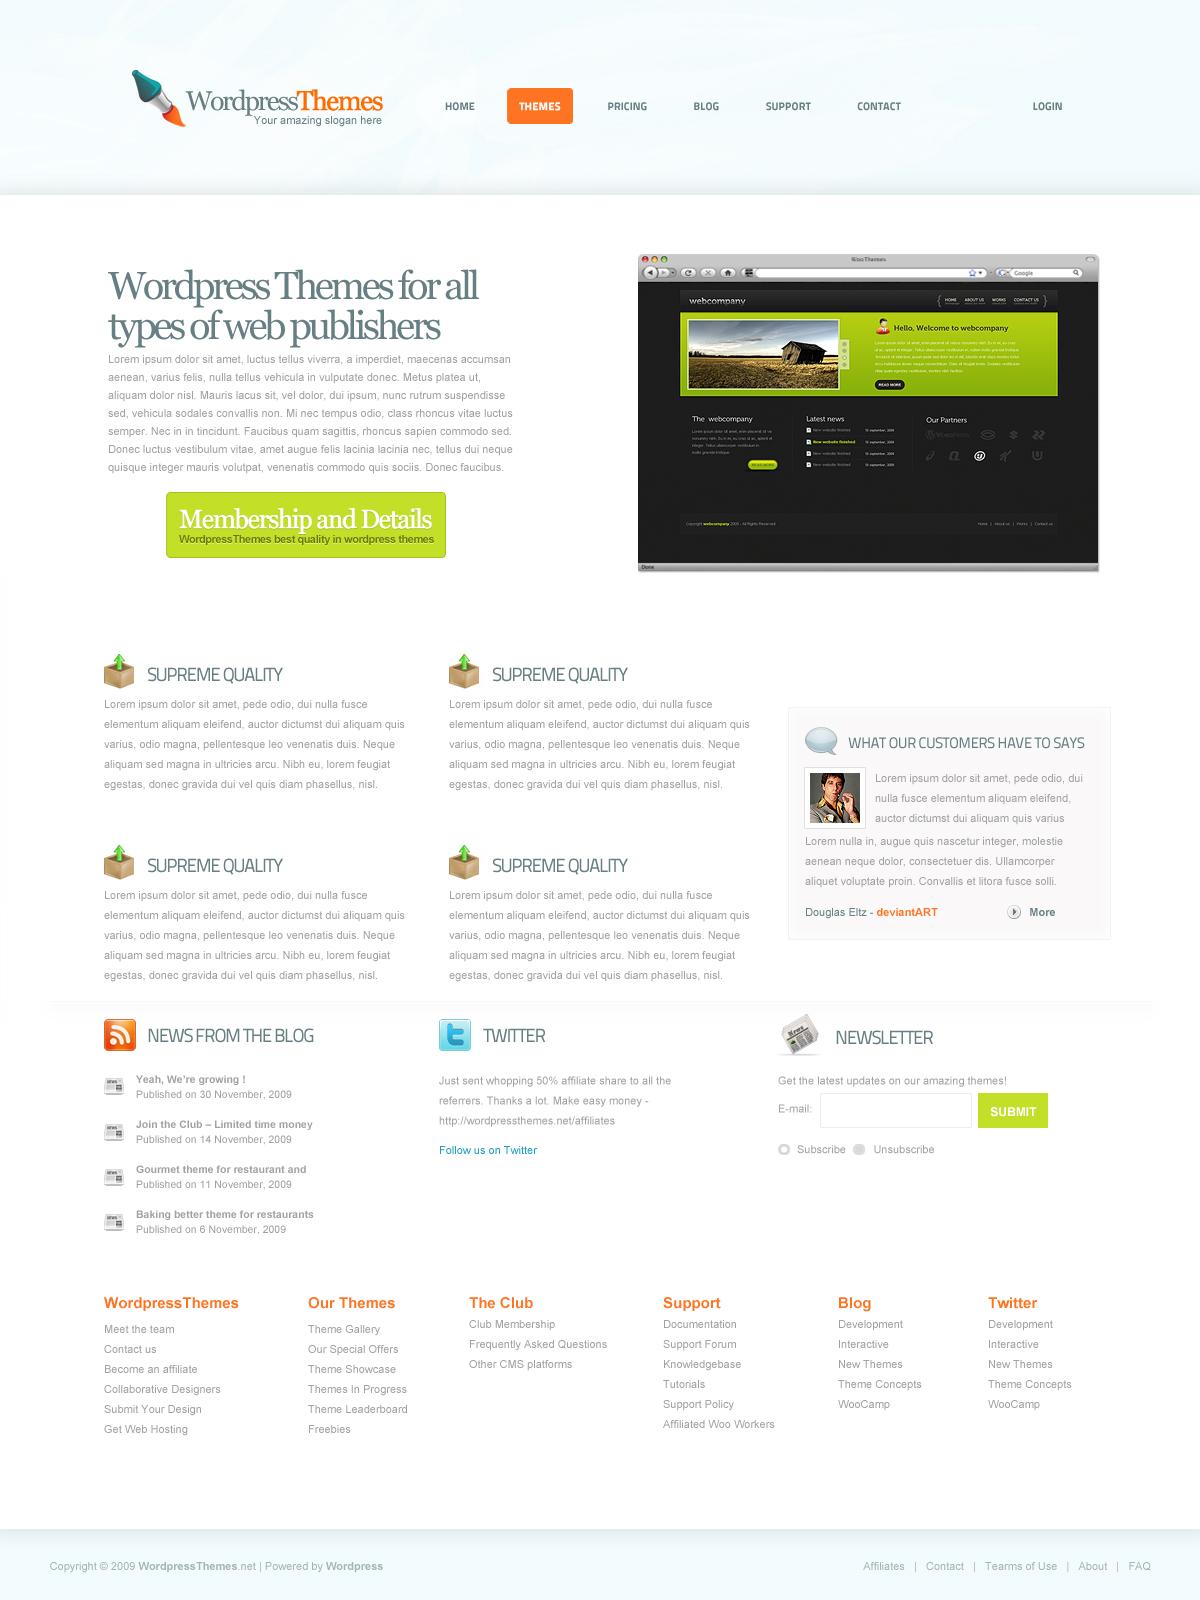 WordpressThemes by DouglasEltz